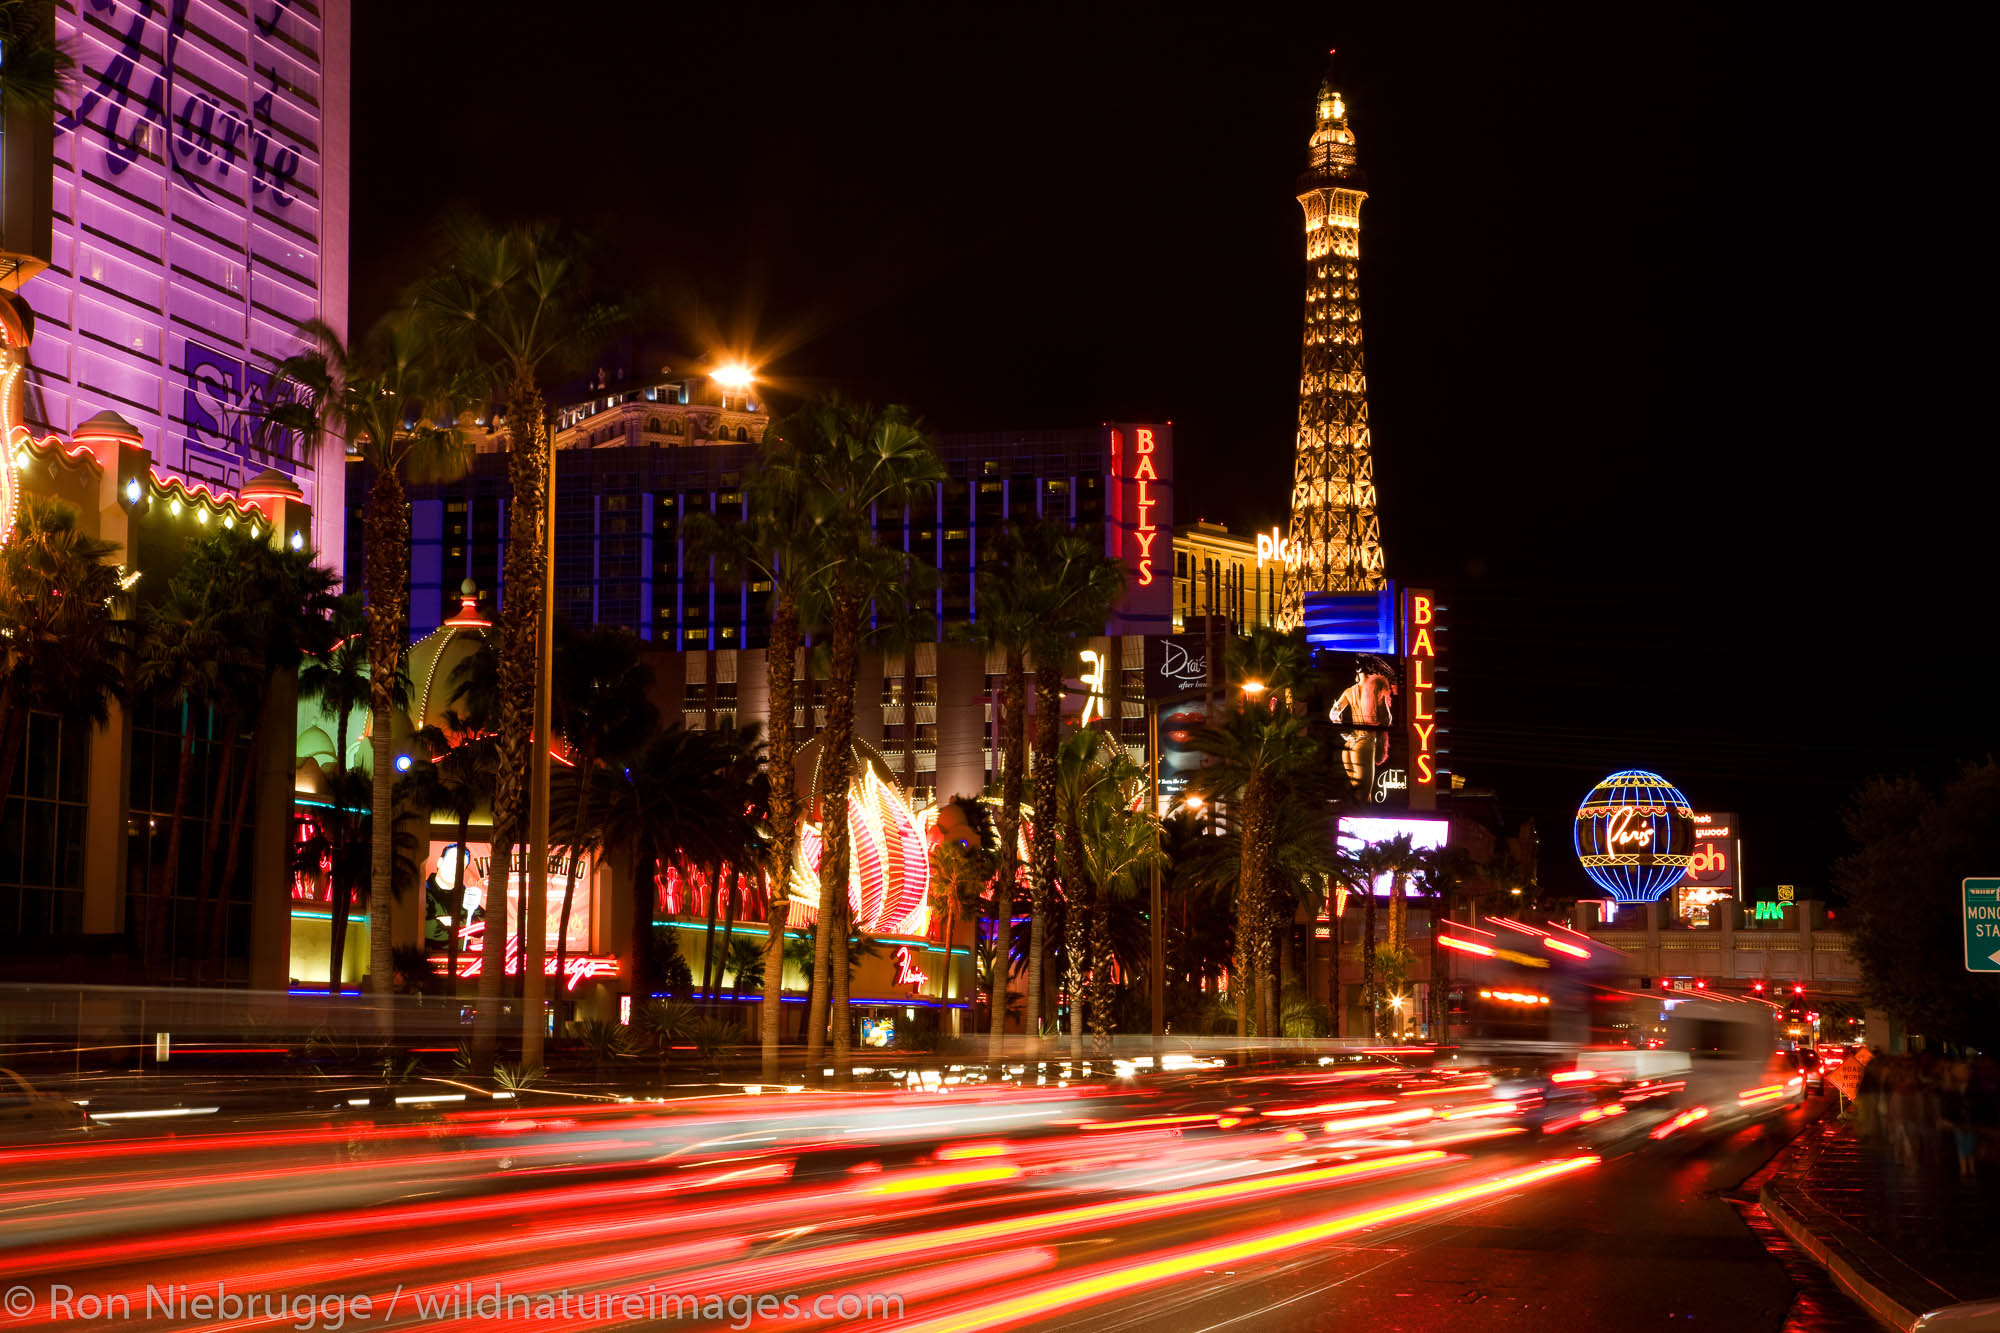 Looking towards the Paris Hotel and Casino on the Strip at night, Las Vegas, Nevada.